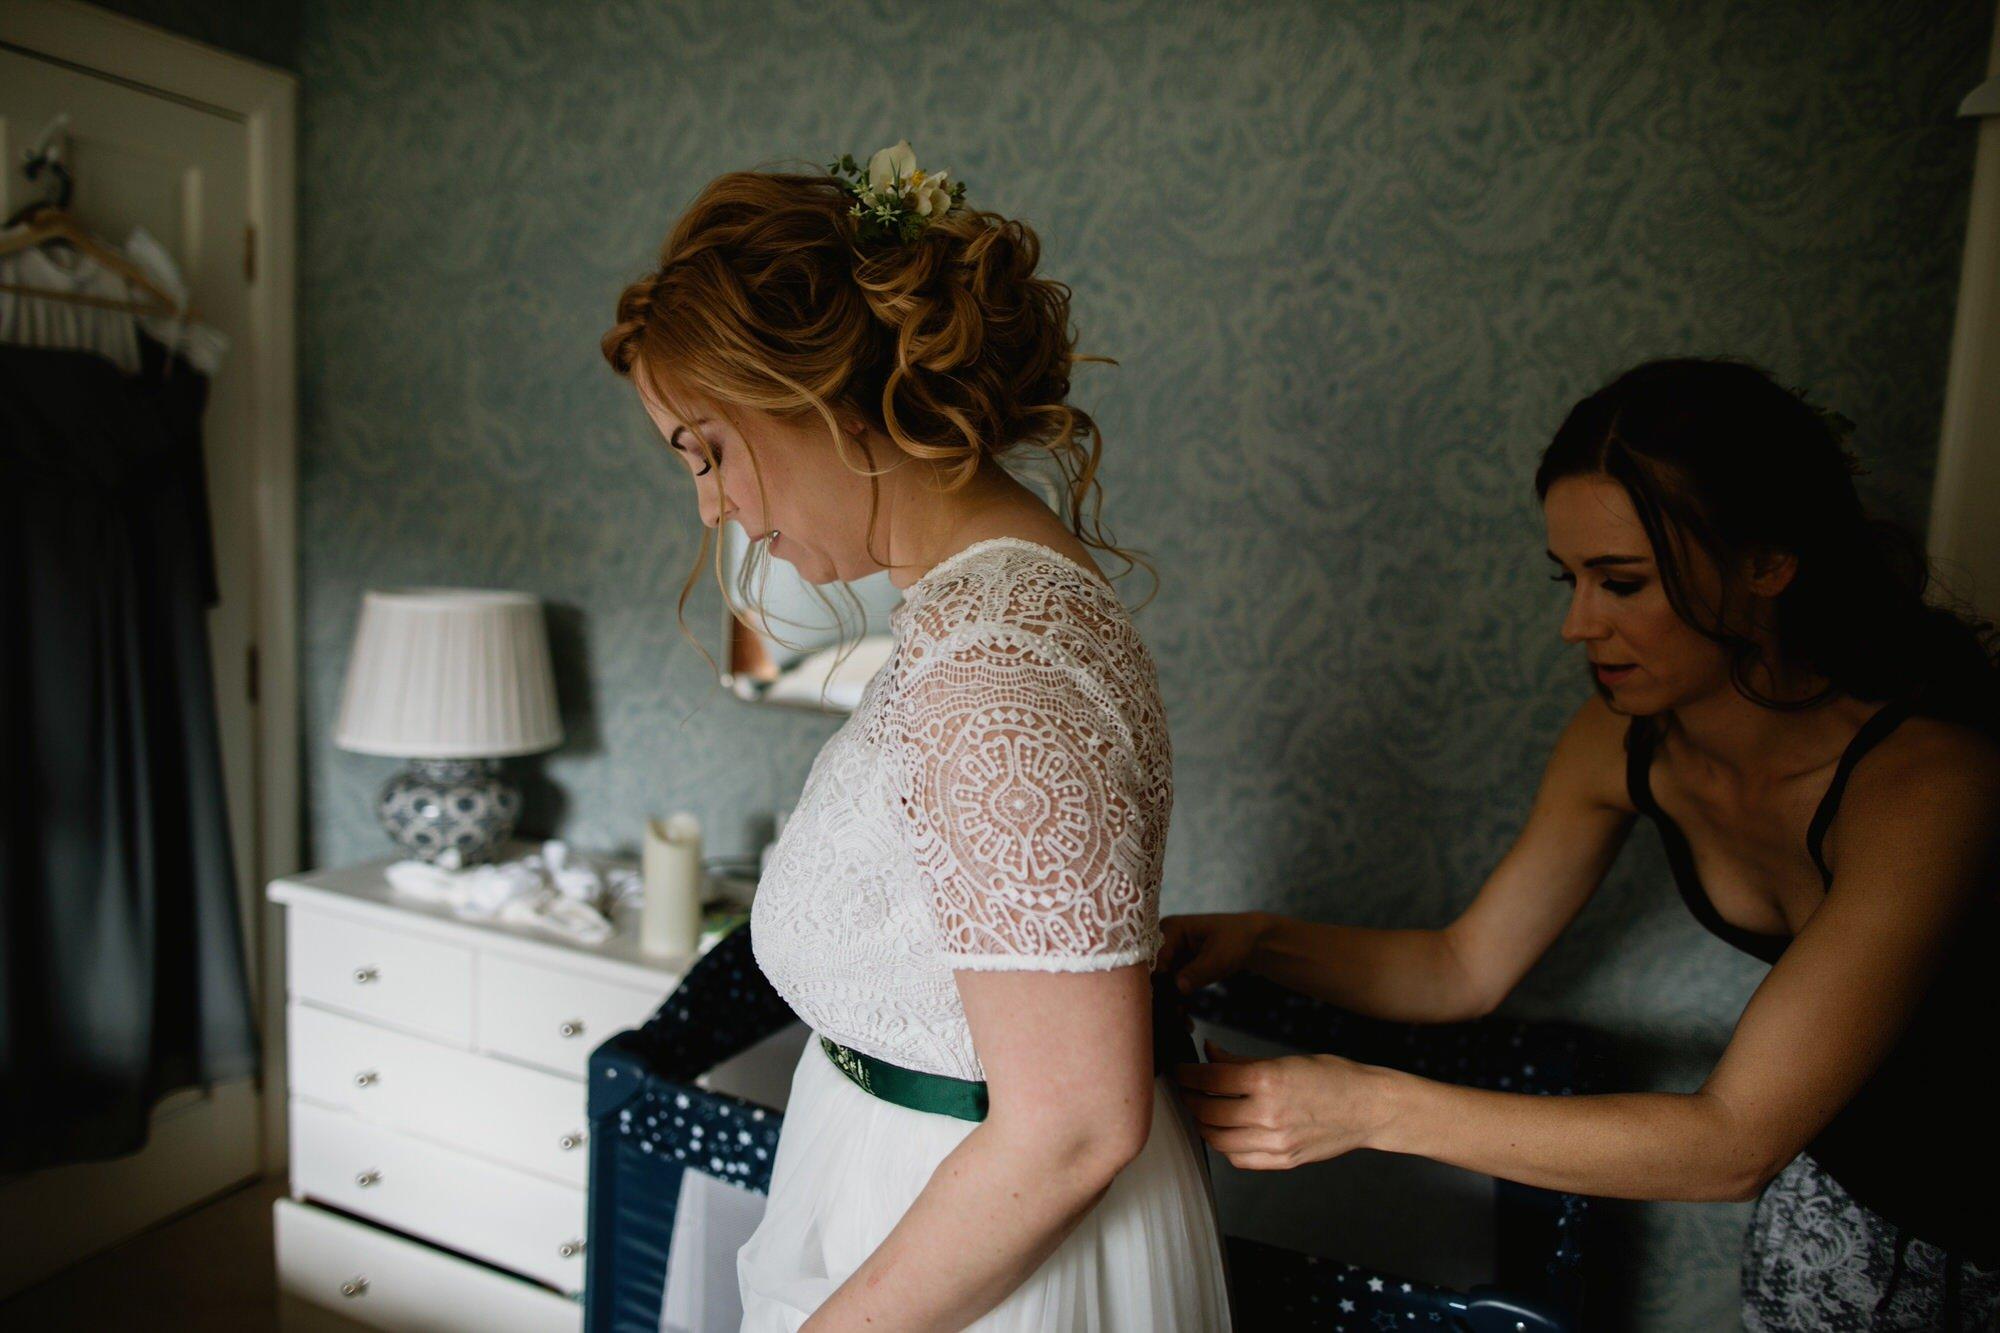 006 TIN SHED KNOCKRAICH WEDDING AUSTRIAN SCOTTISH ZOE ALEXANDRA PHOTOGRAPHY